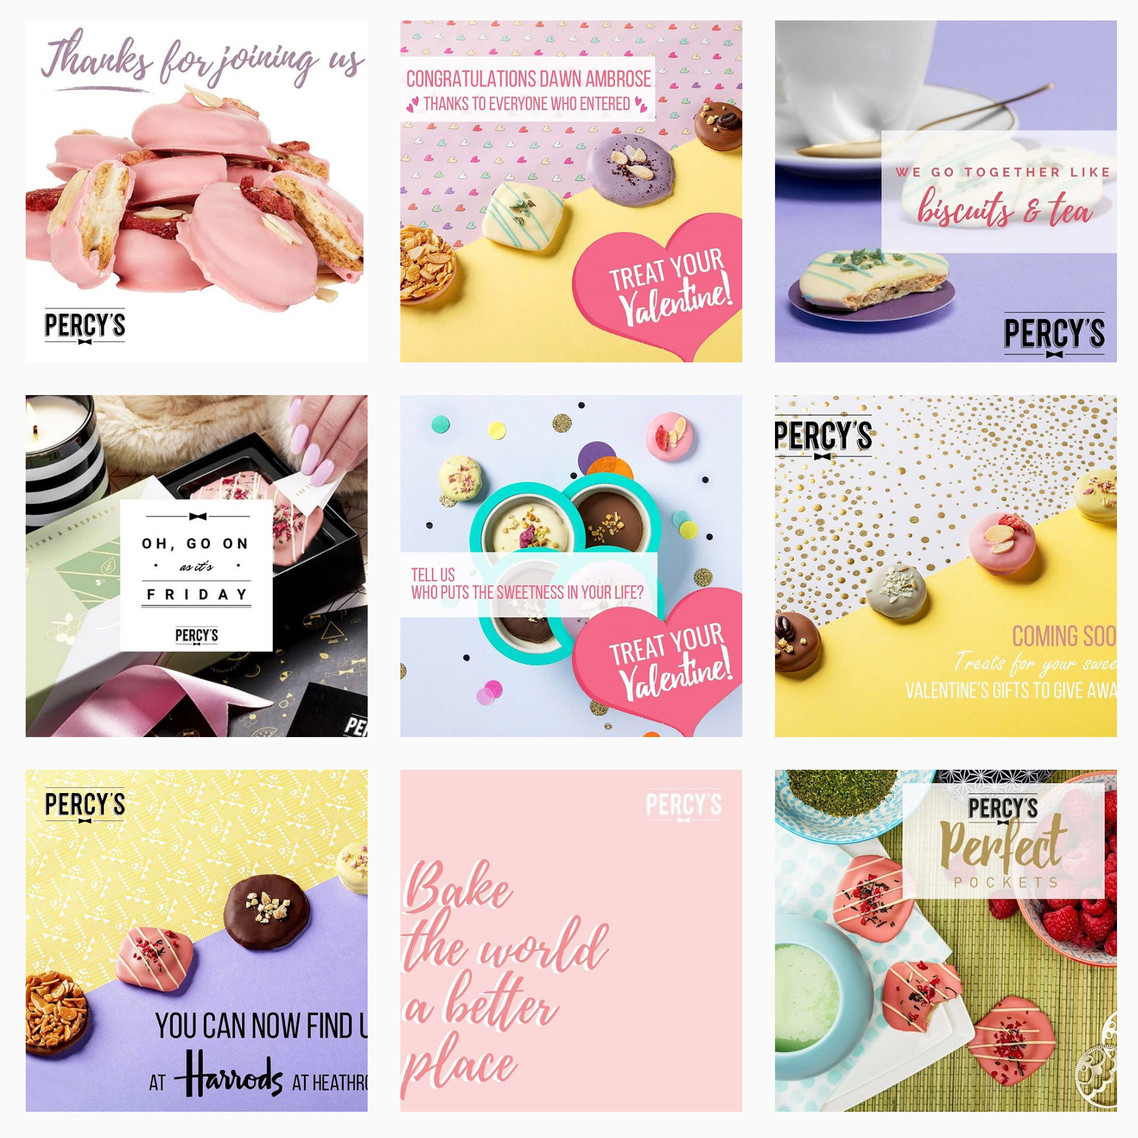 Percy's luxury biscuits Instagram